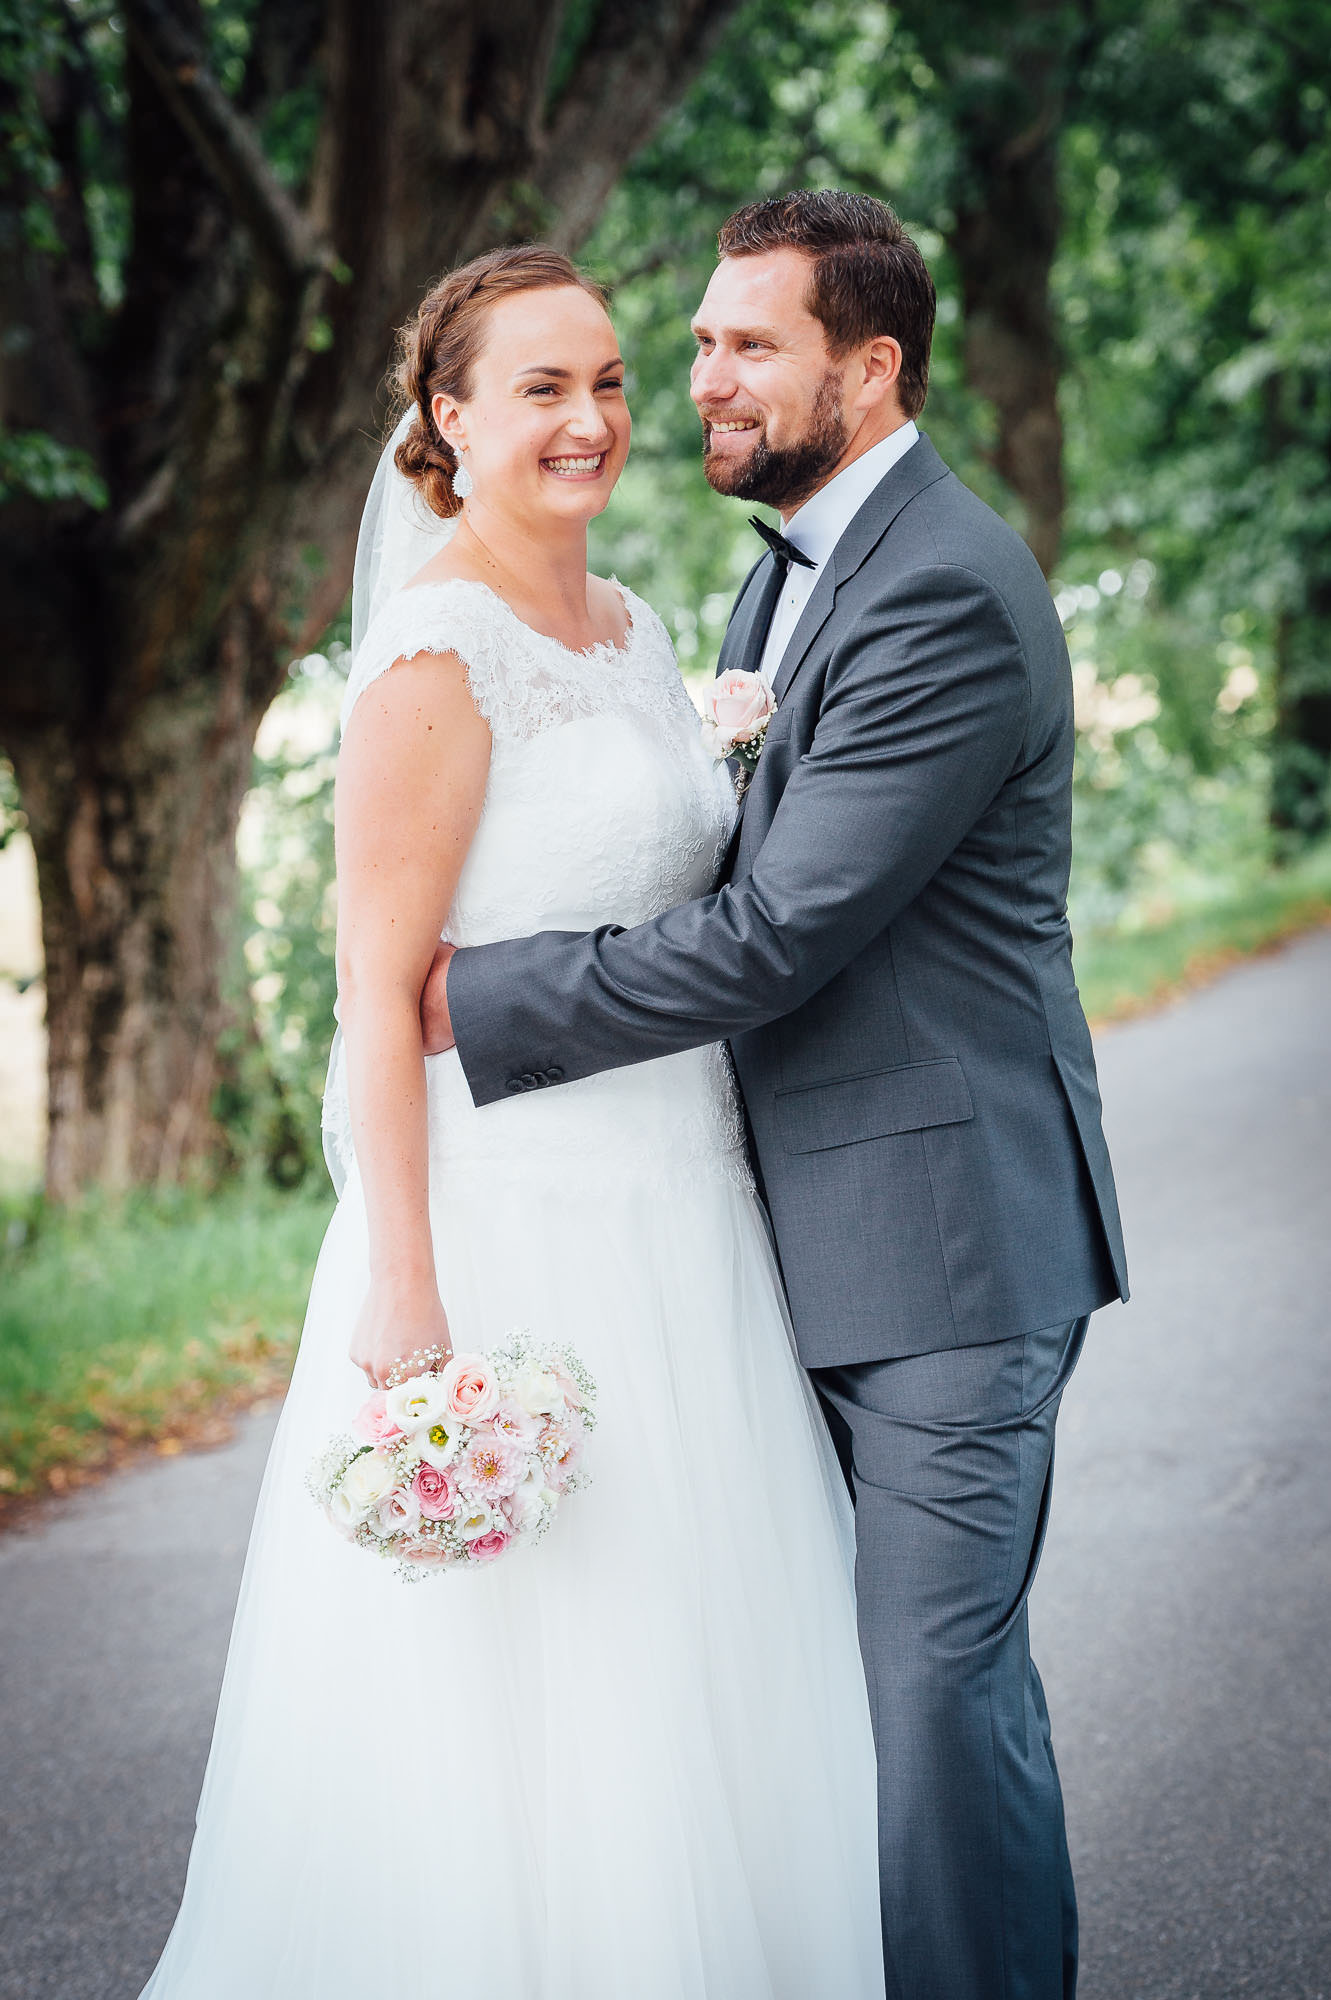 Bryllupsfotograf-Porsgrunn-Skien-Dag-Frogner-7